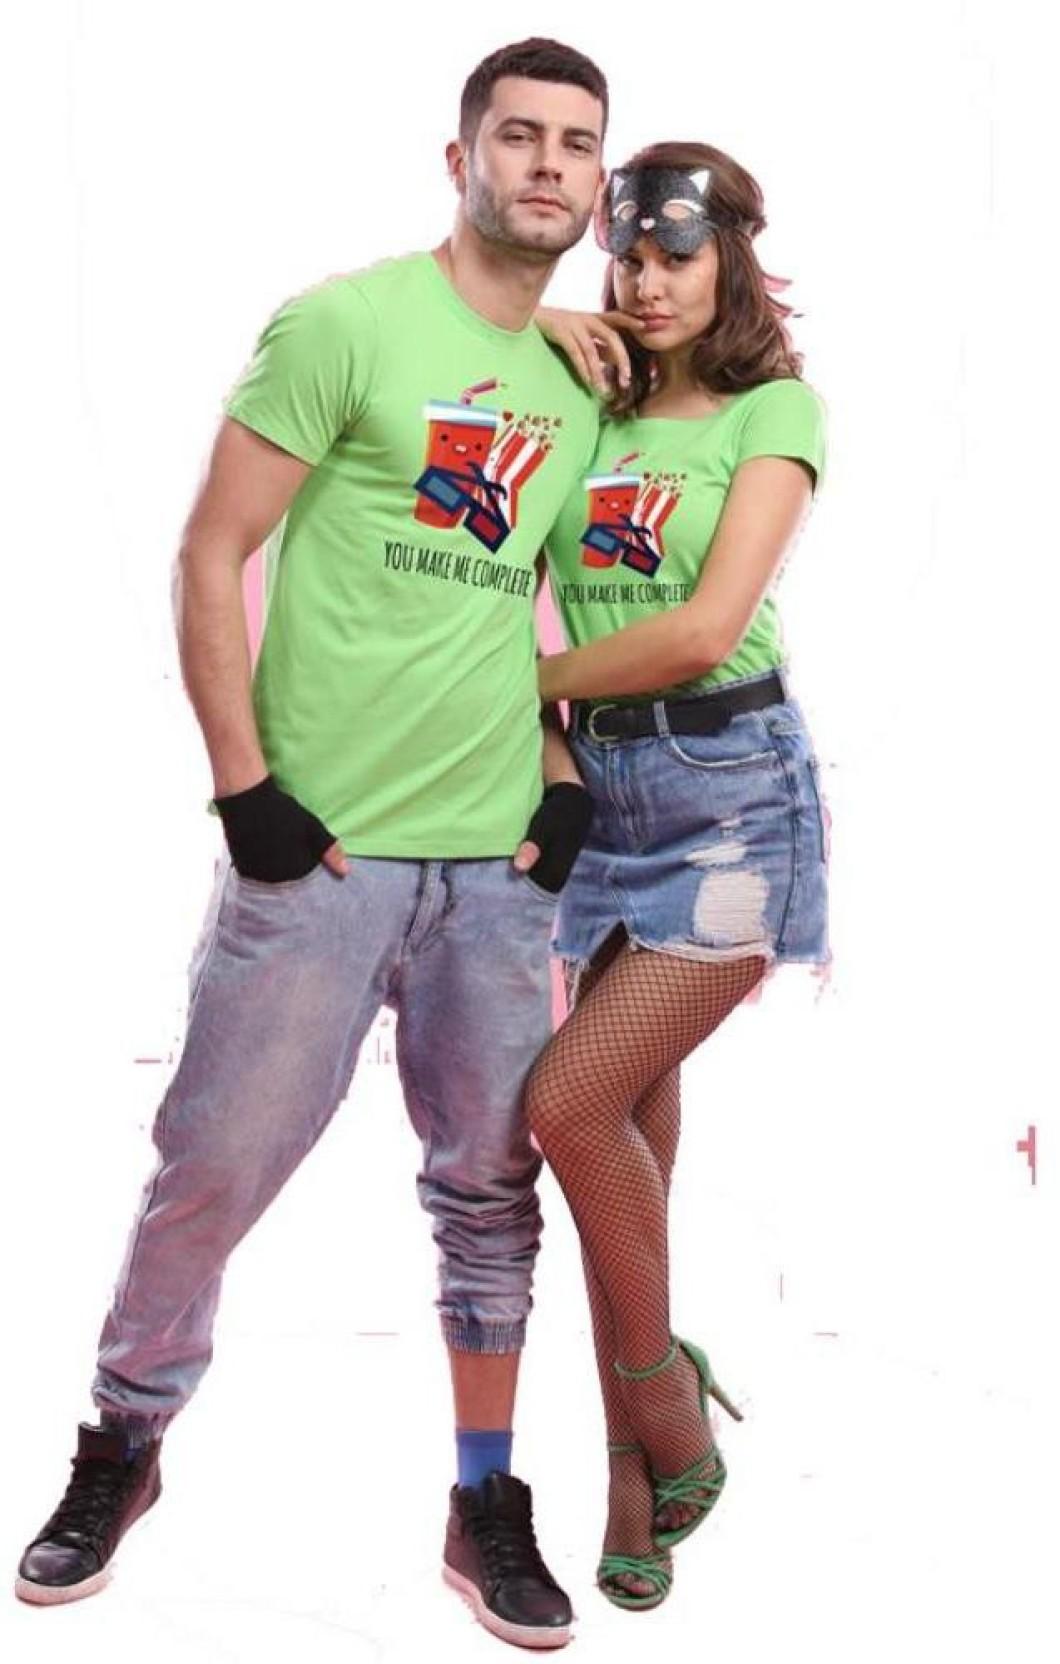 0c346fec6c BonOrganik Printed Men's & Women's Round Neck Green T-Shirt (Pack of 2)